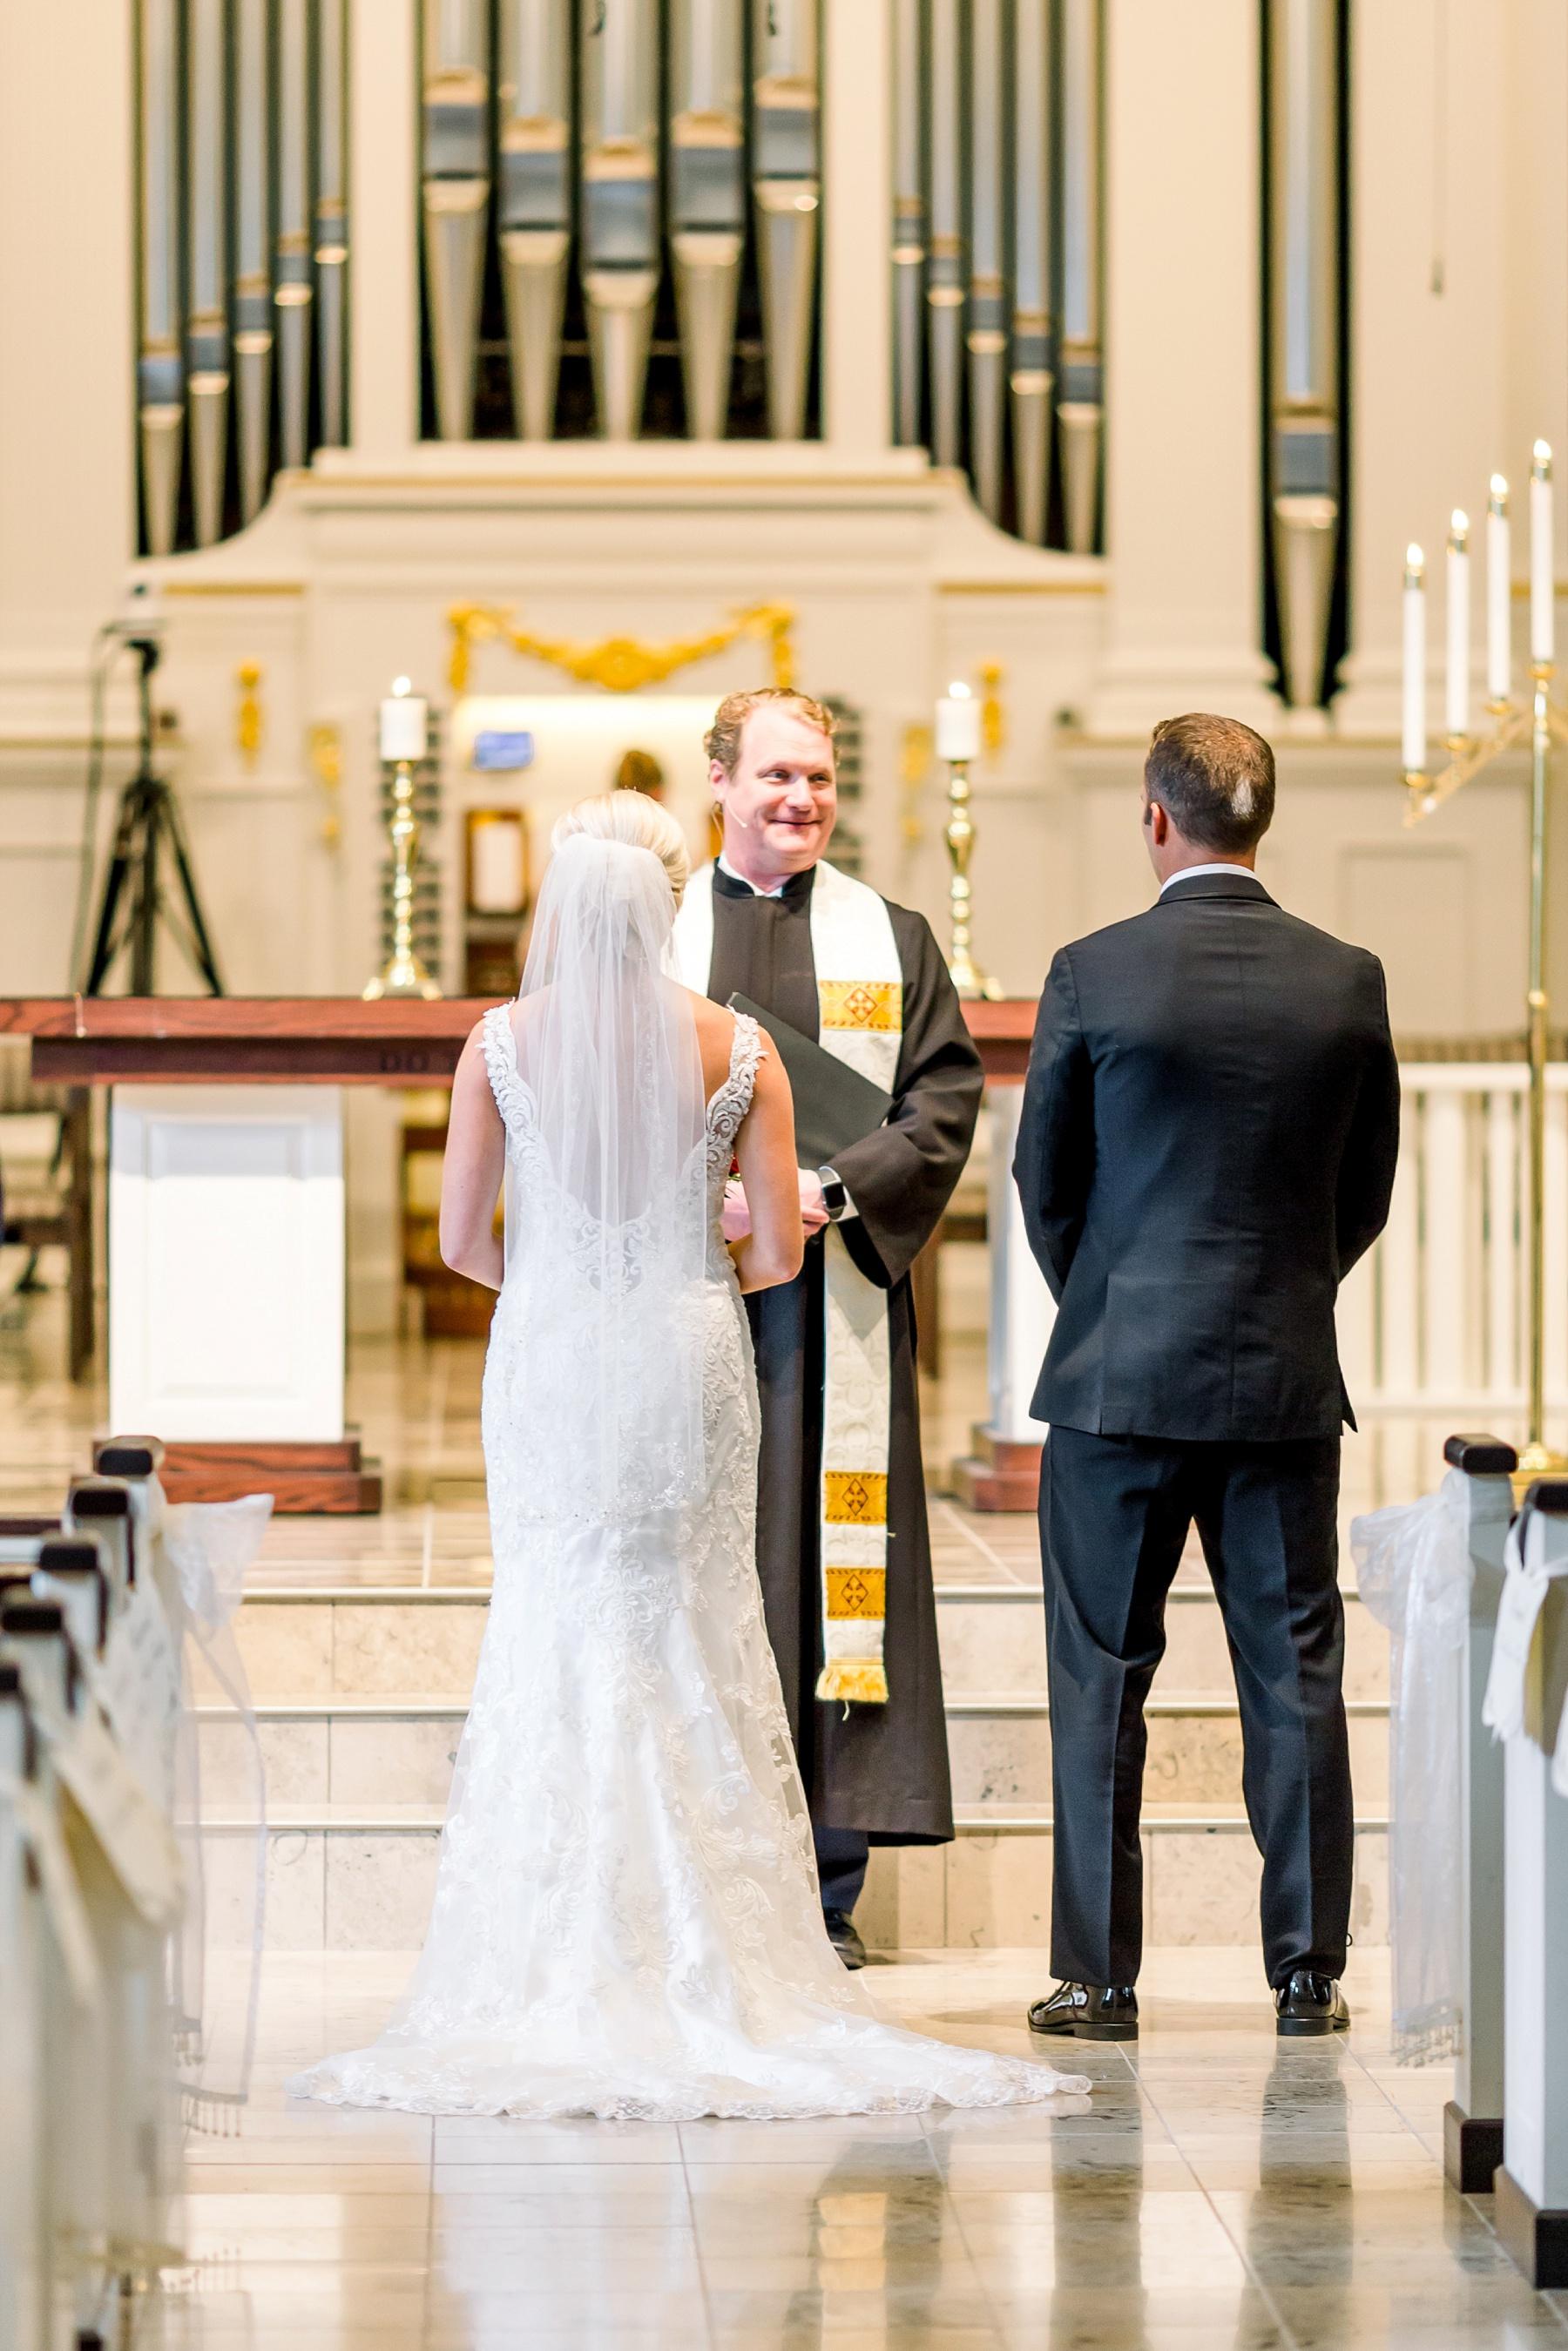 midwest-adventurous-wedding-photographer-elizabeth-ladean-photography-photo_4764.jpg